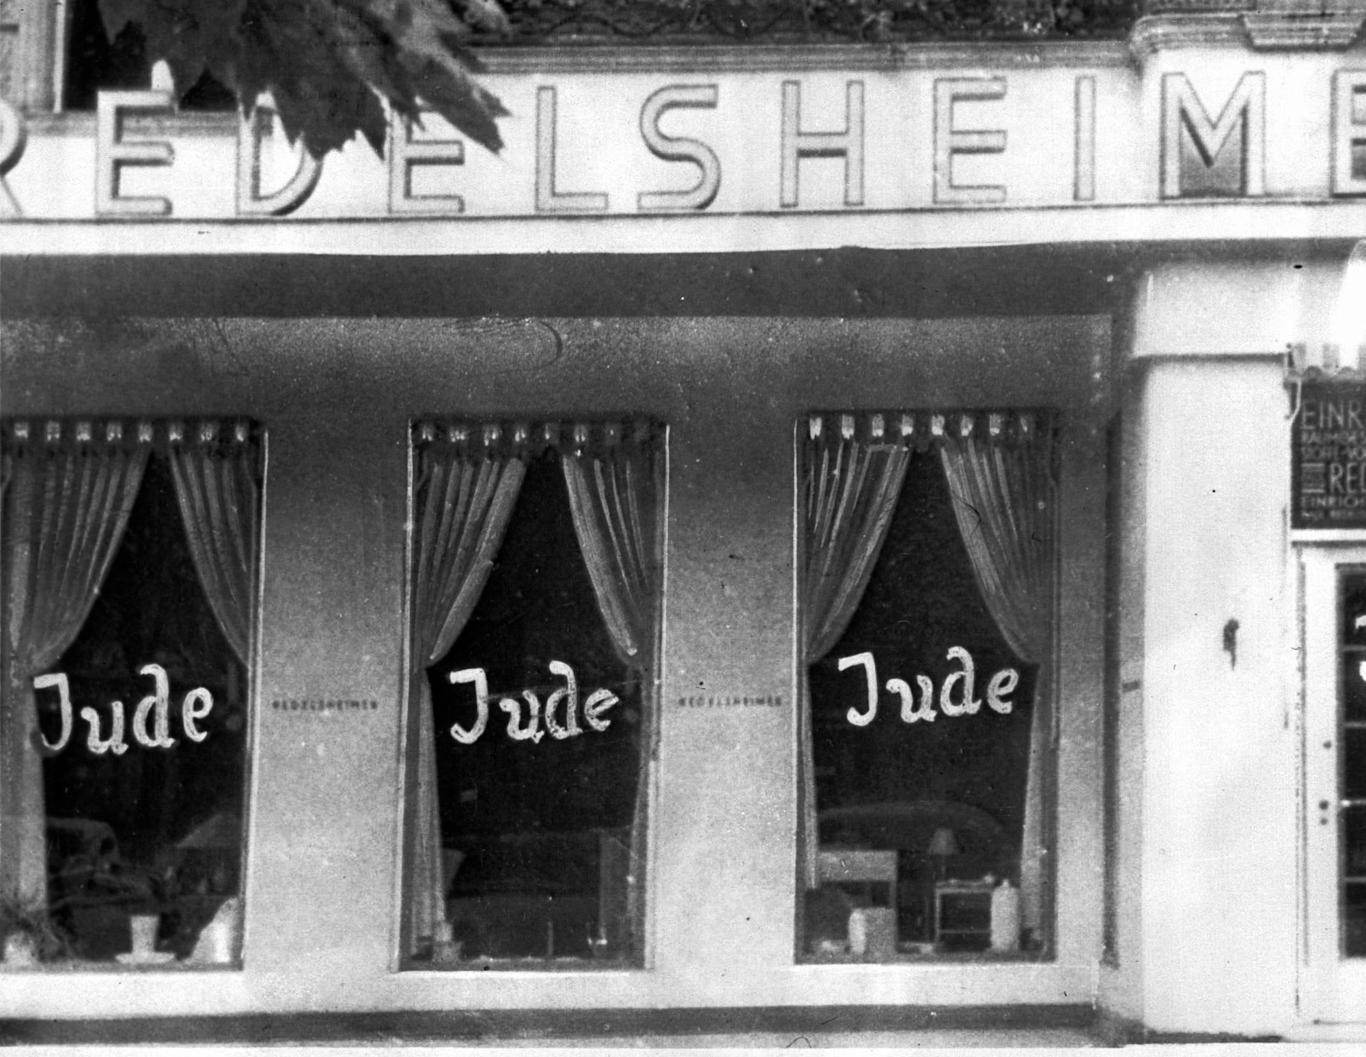 Jude (jew)